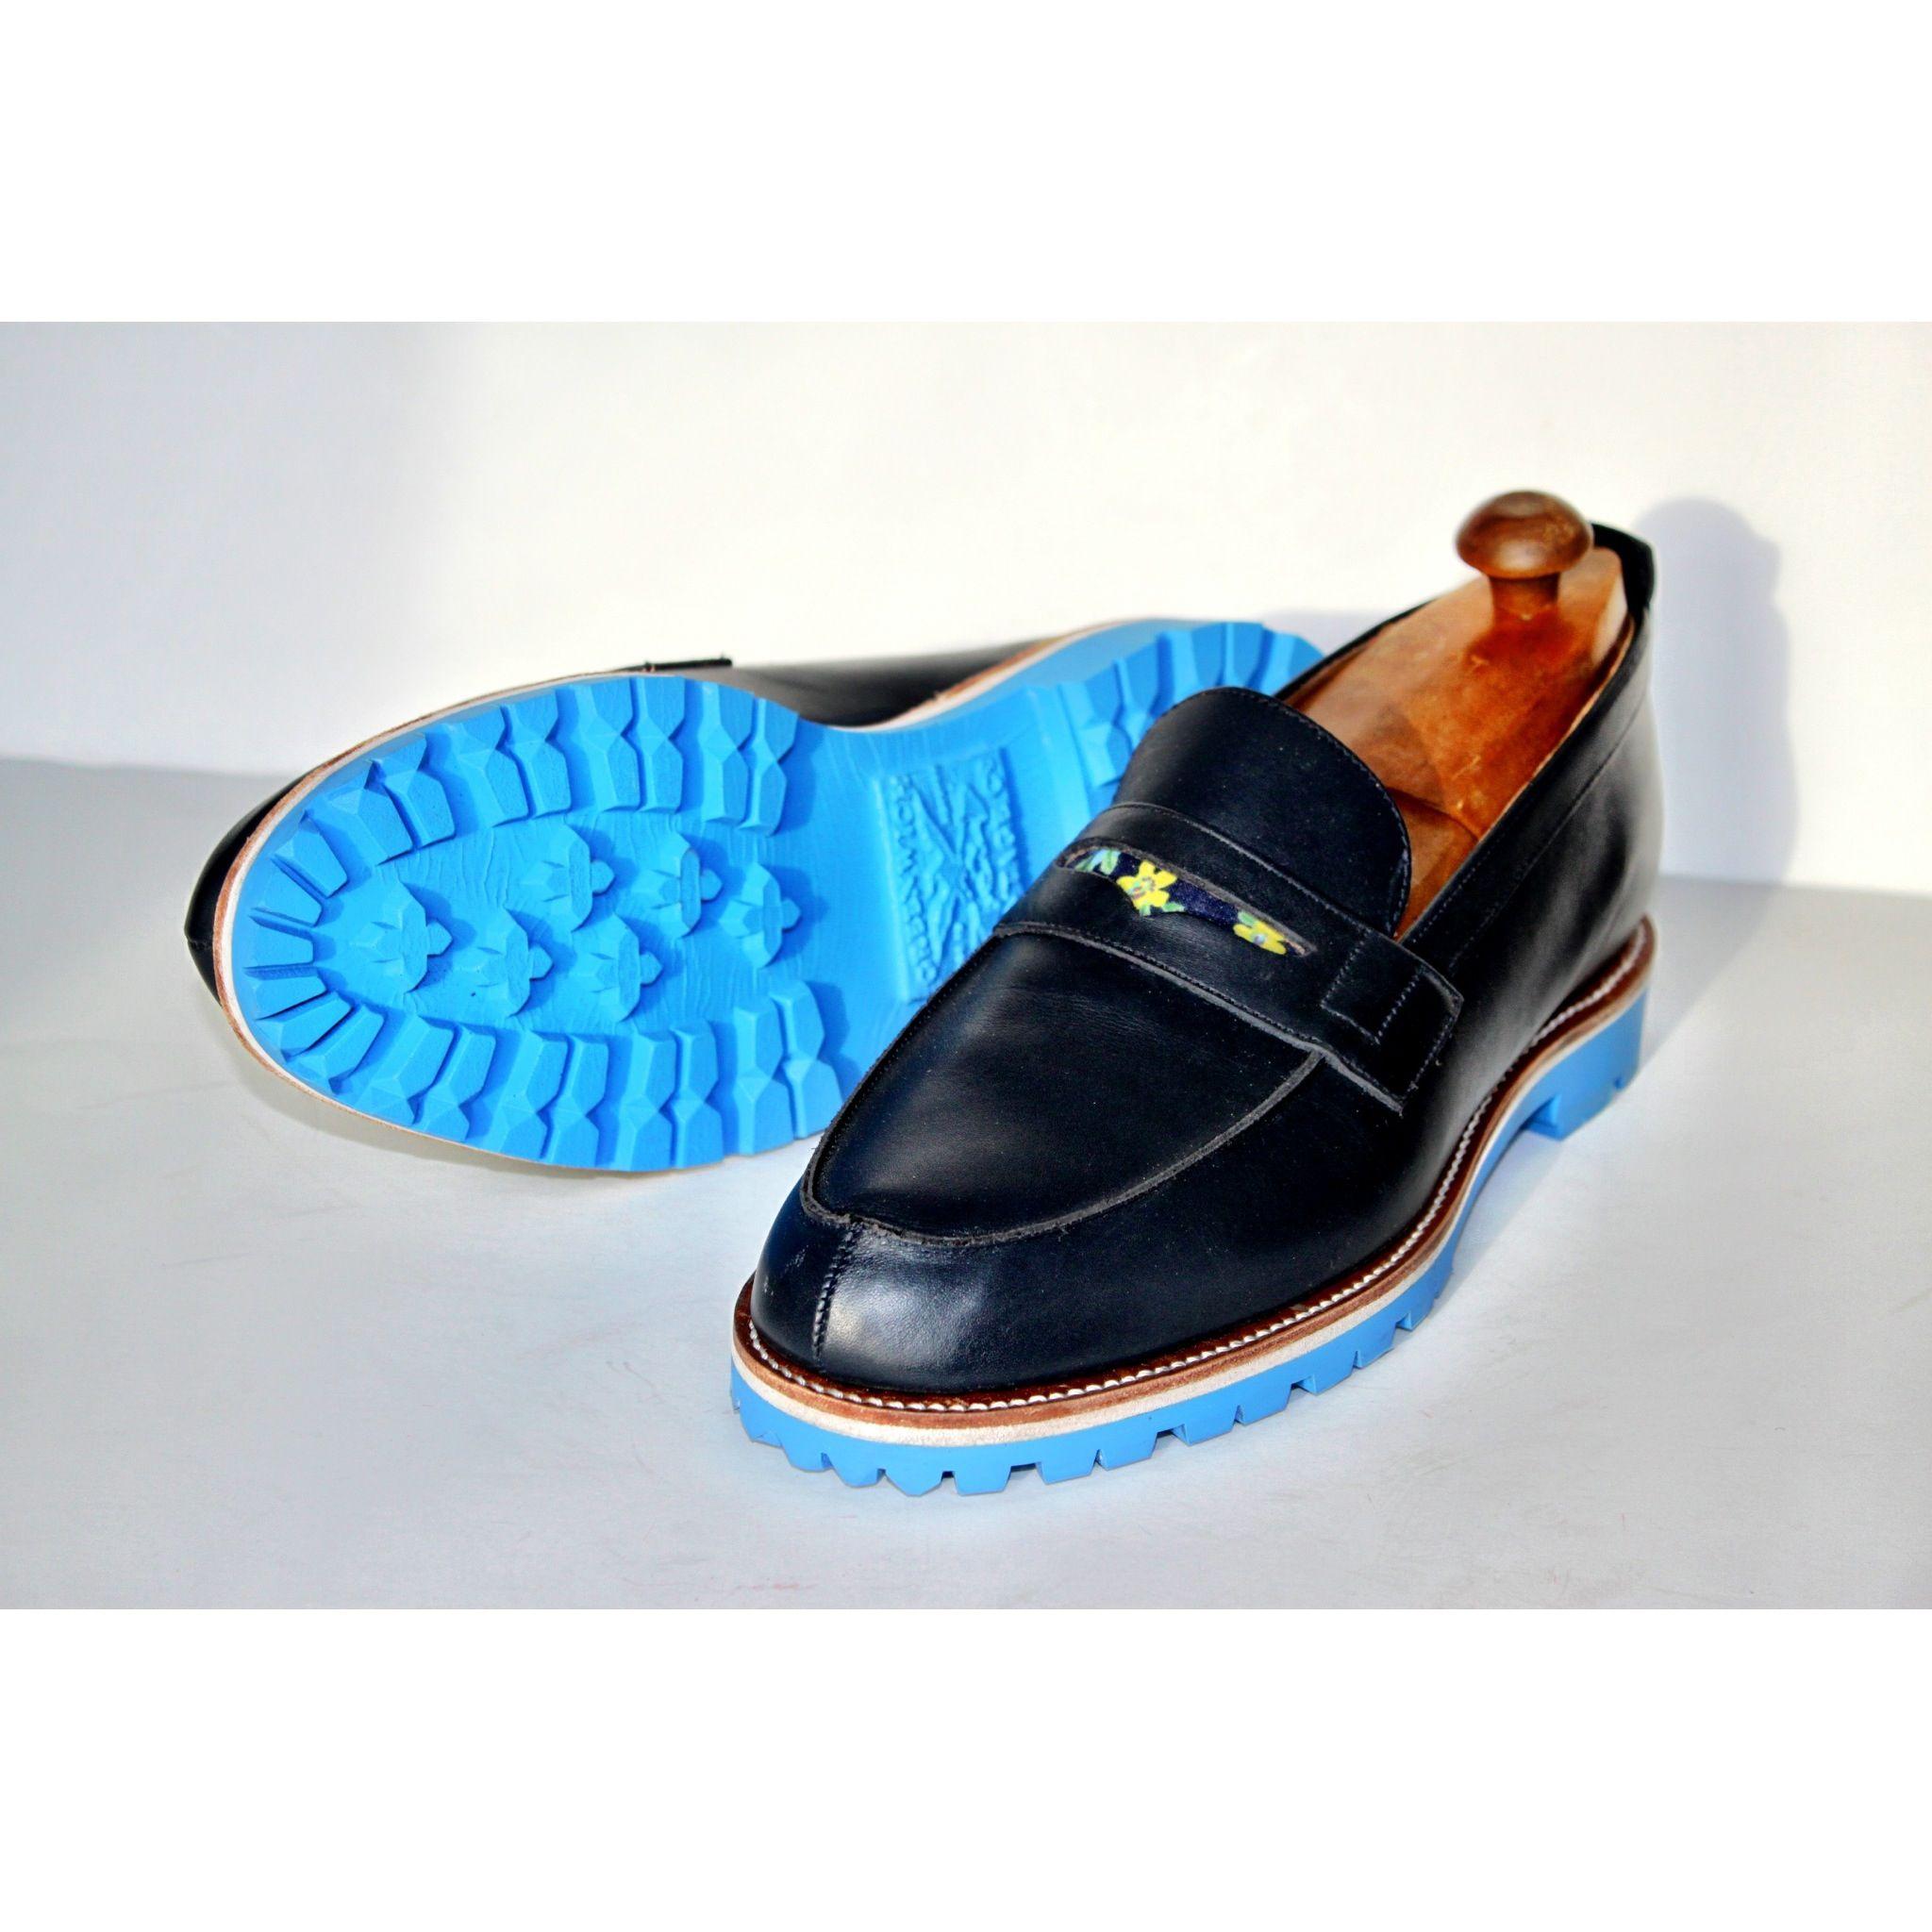 Dress shoes men, Loafers men, Penny loafers